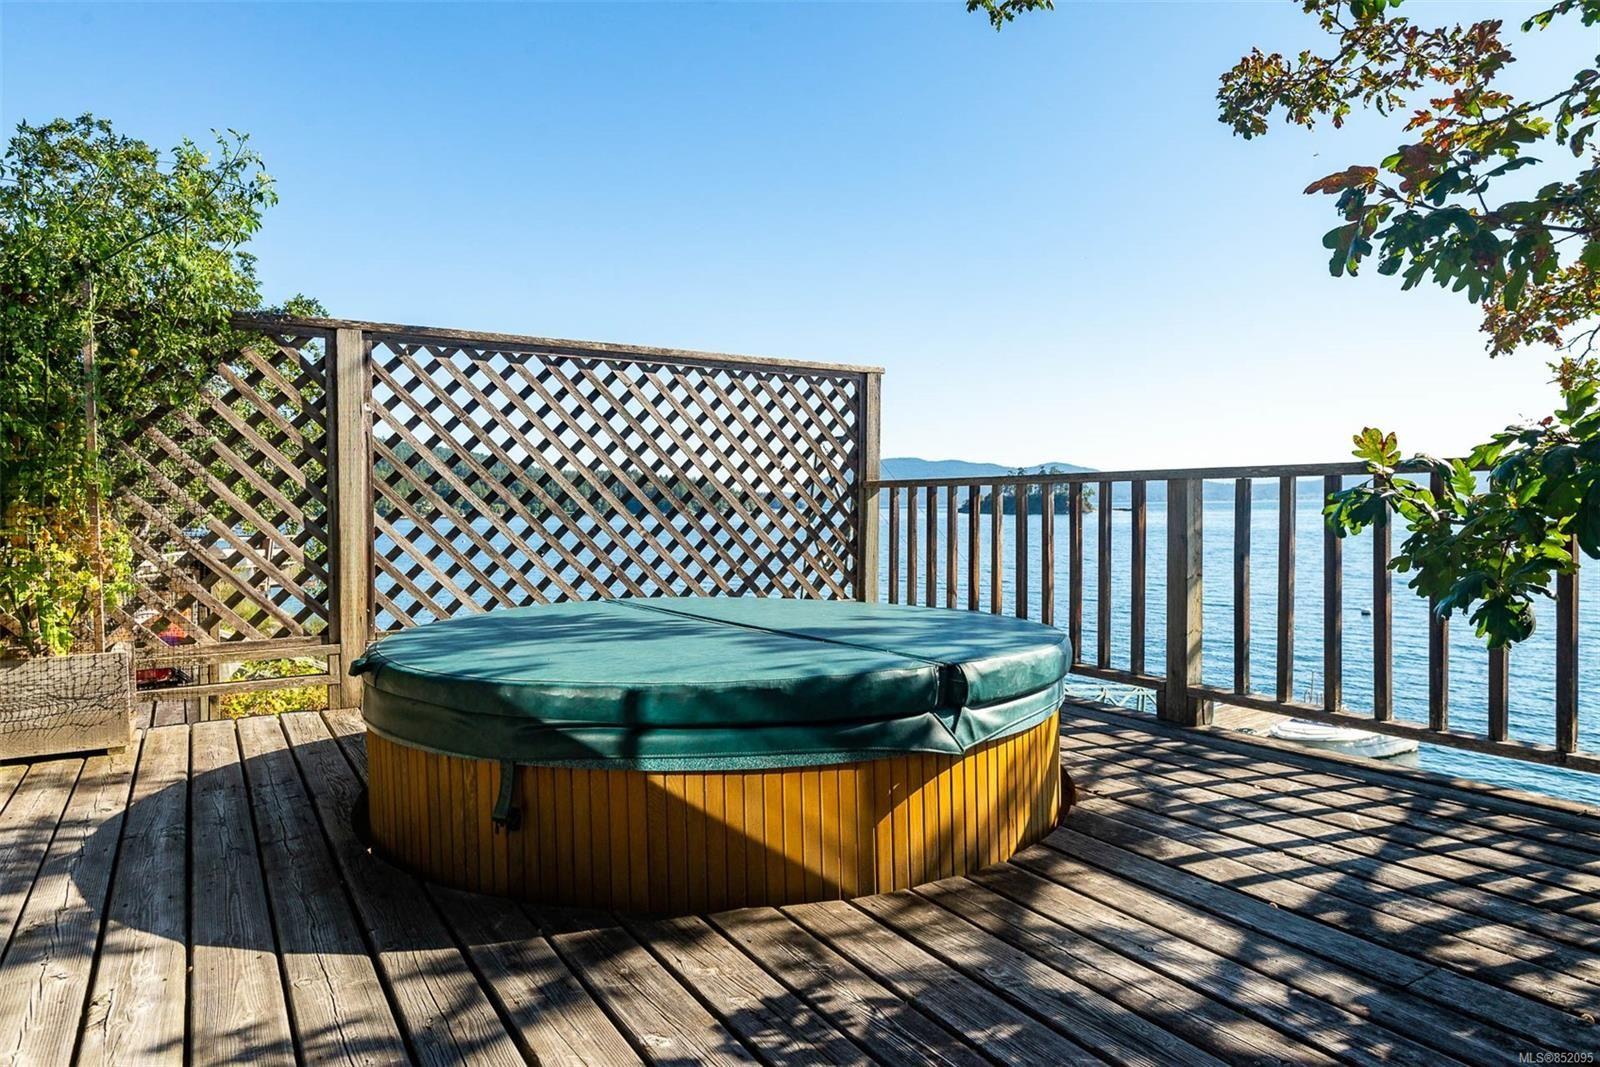 Photo 22: Photos: 236 McGill Rd in : GI Salt Spring House for sale (Gulf Islands)  : MLS®# 852095